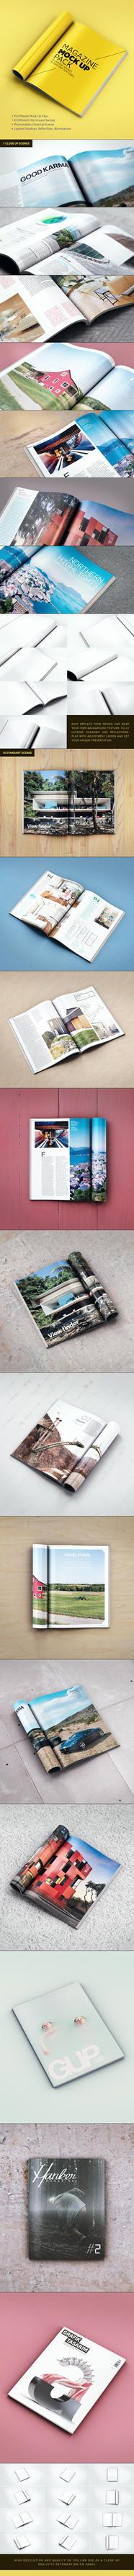 Magazine Mock Up Pack by mucahitgayiran